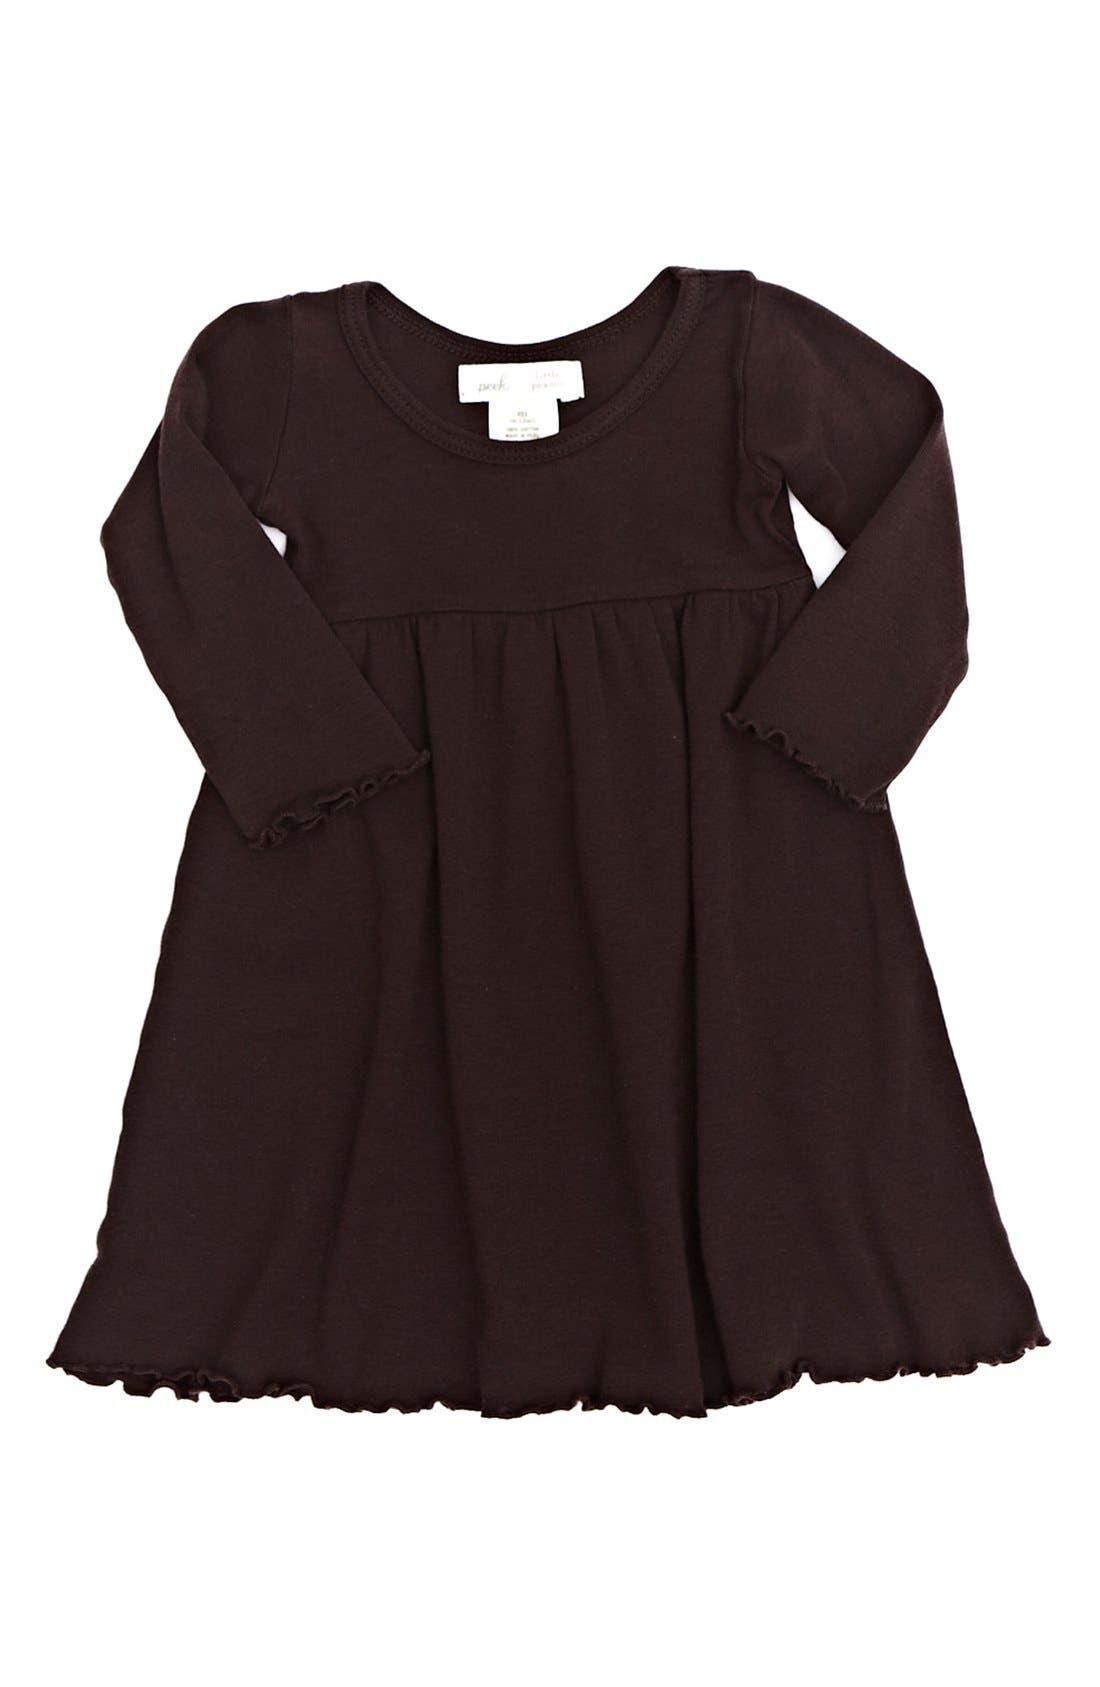 Alternate Image 1 Selected - Peek 'Little Peanut' Dress (Baby Girls)